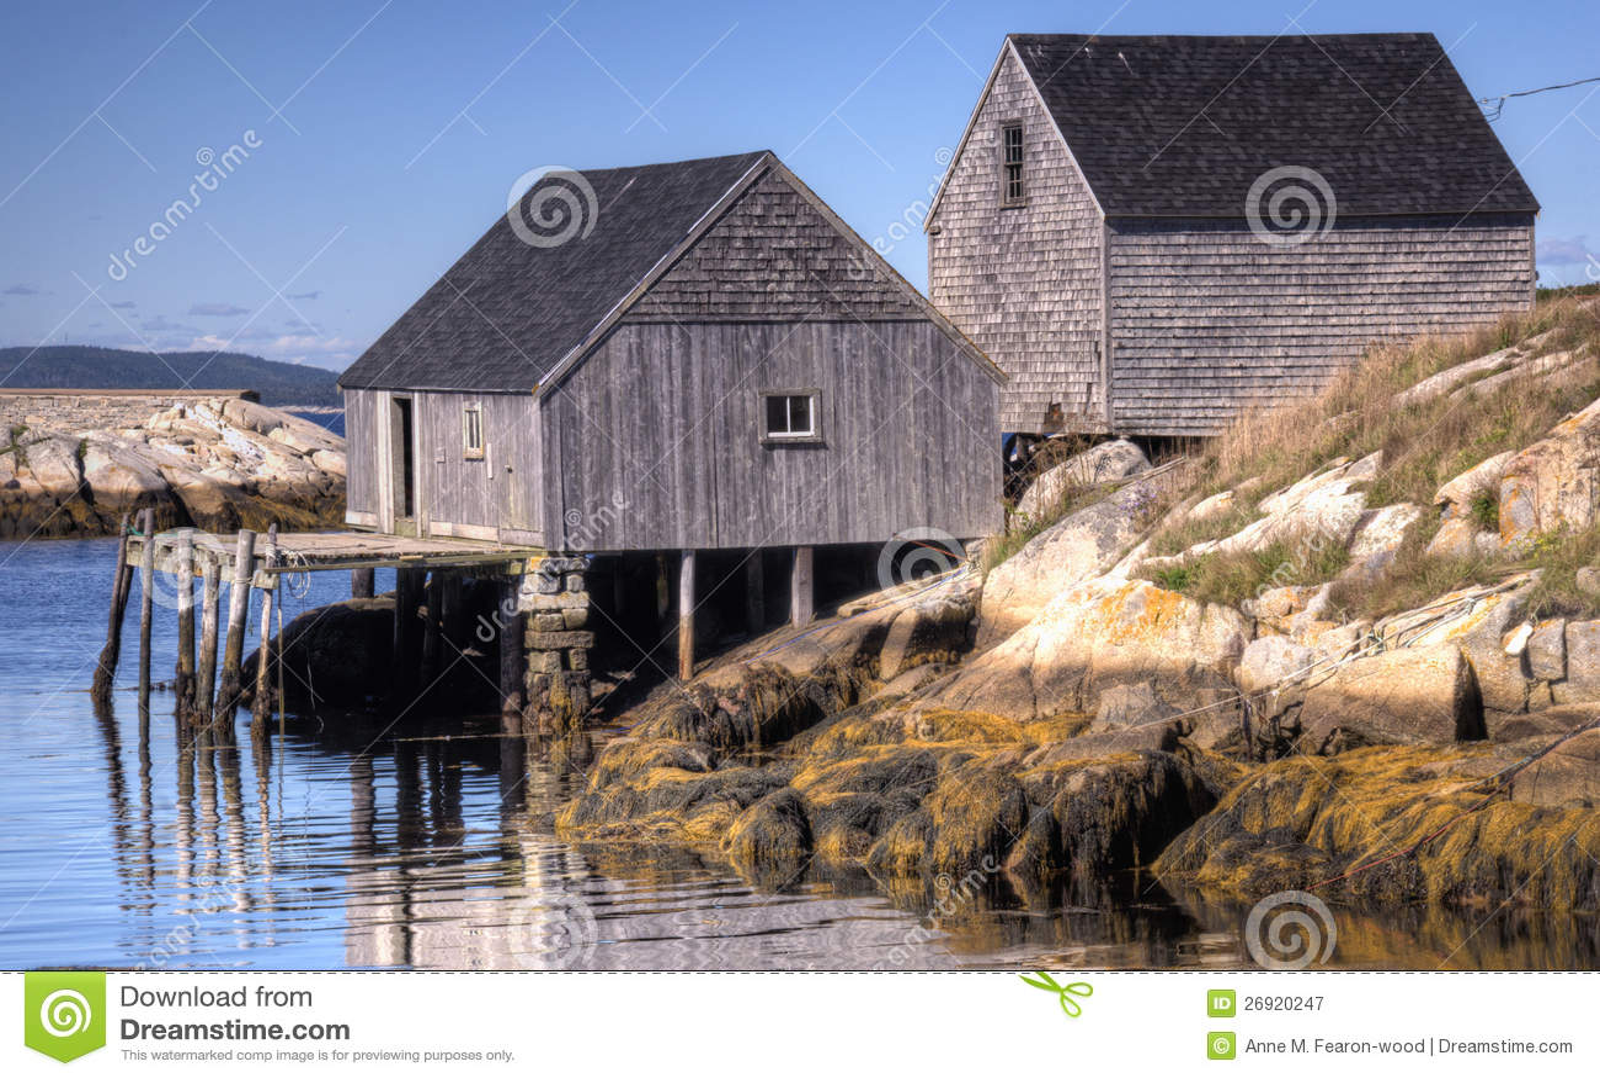 Old Fishing Shacks, Peggy's Cove, Nova Scotia Royalty Free Stock Photography - Image: 26920247